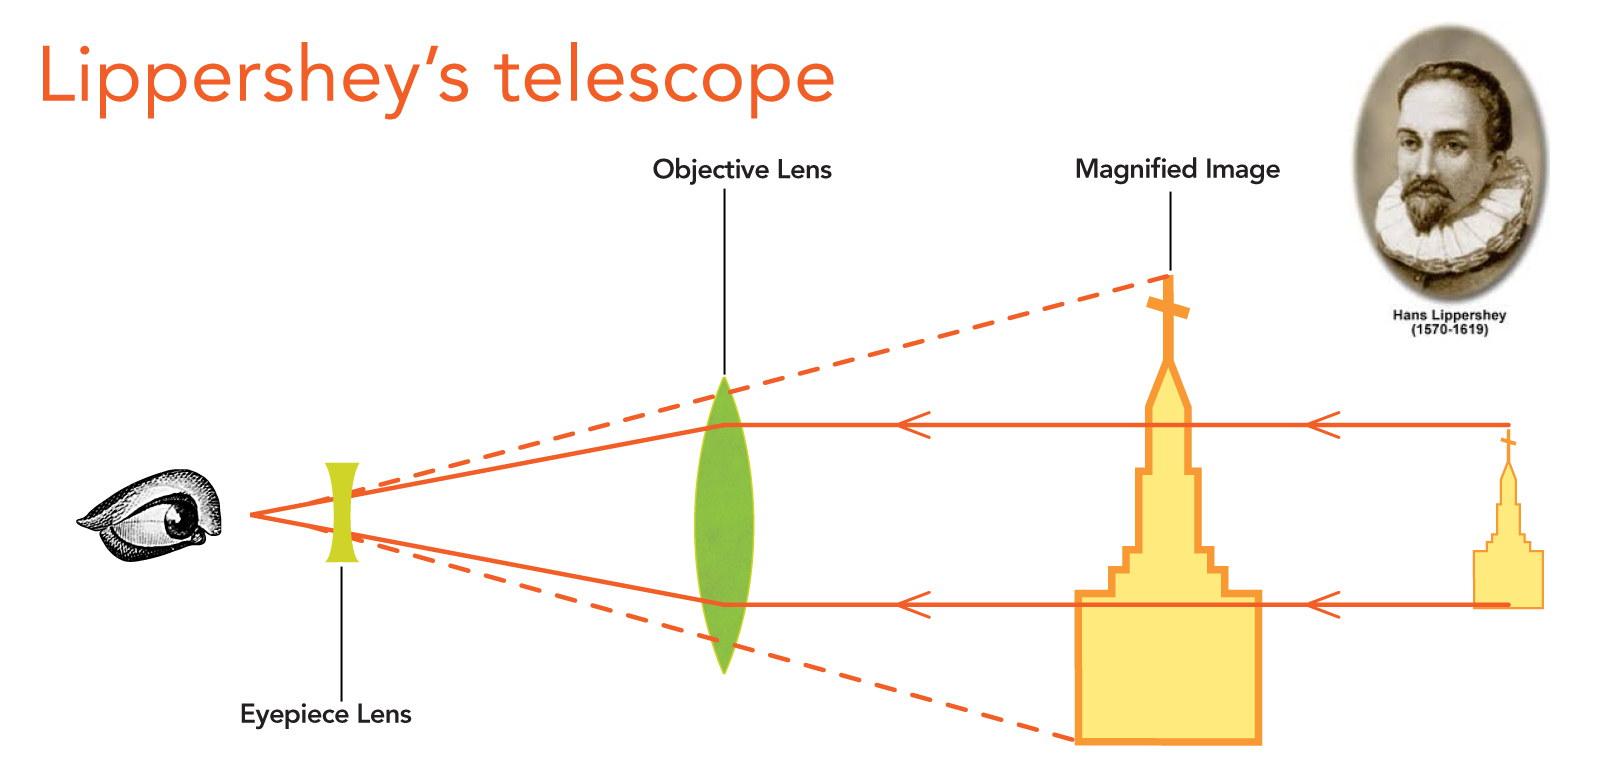 Hans Lippershey Telescope